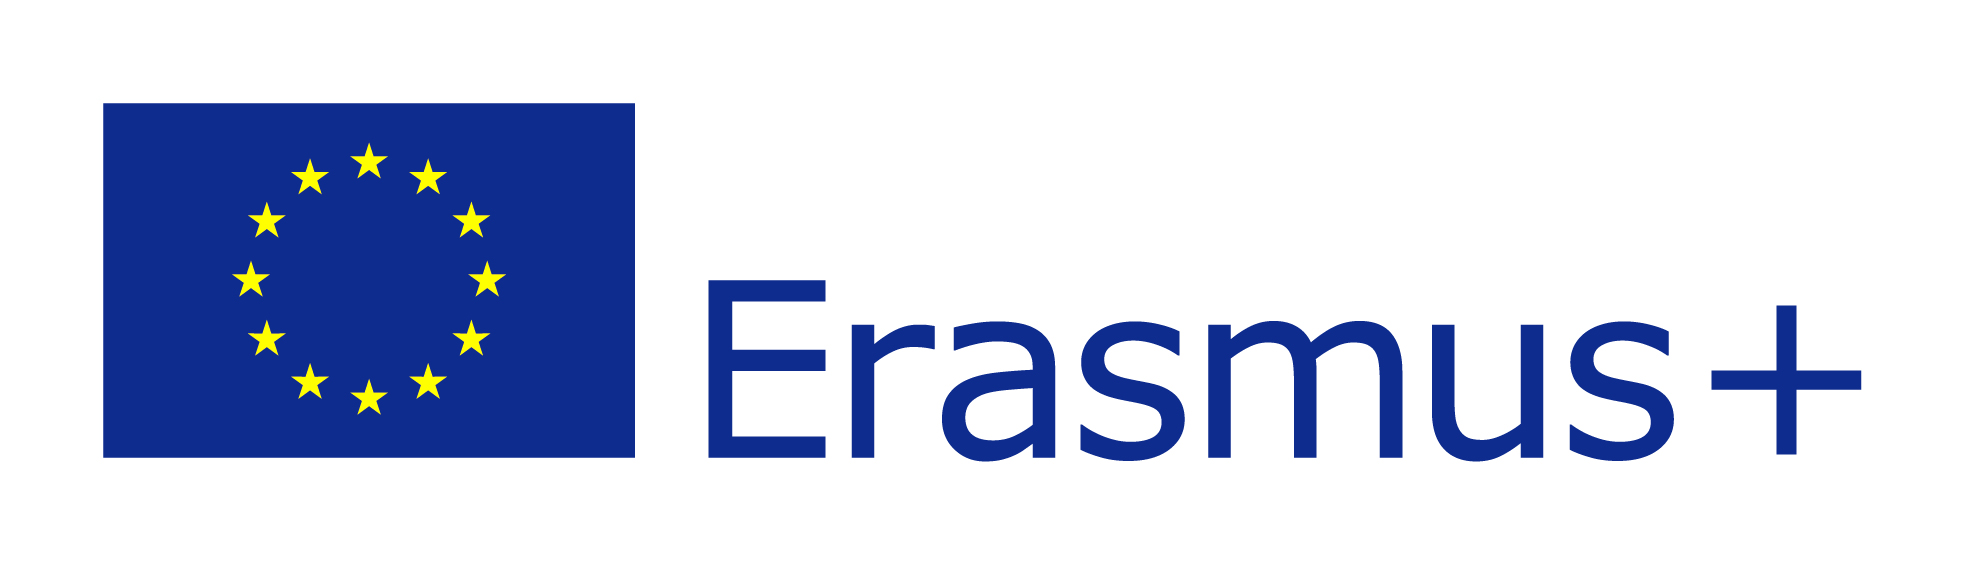 flaga erasmus width=